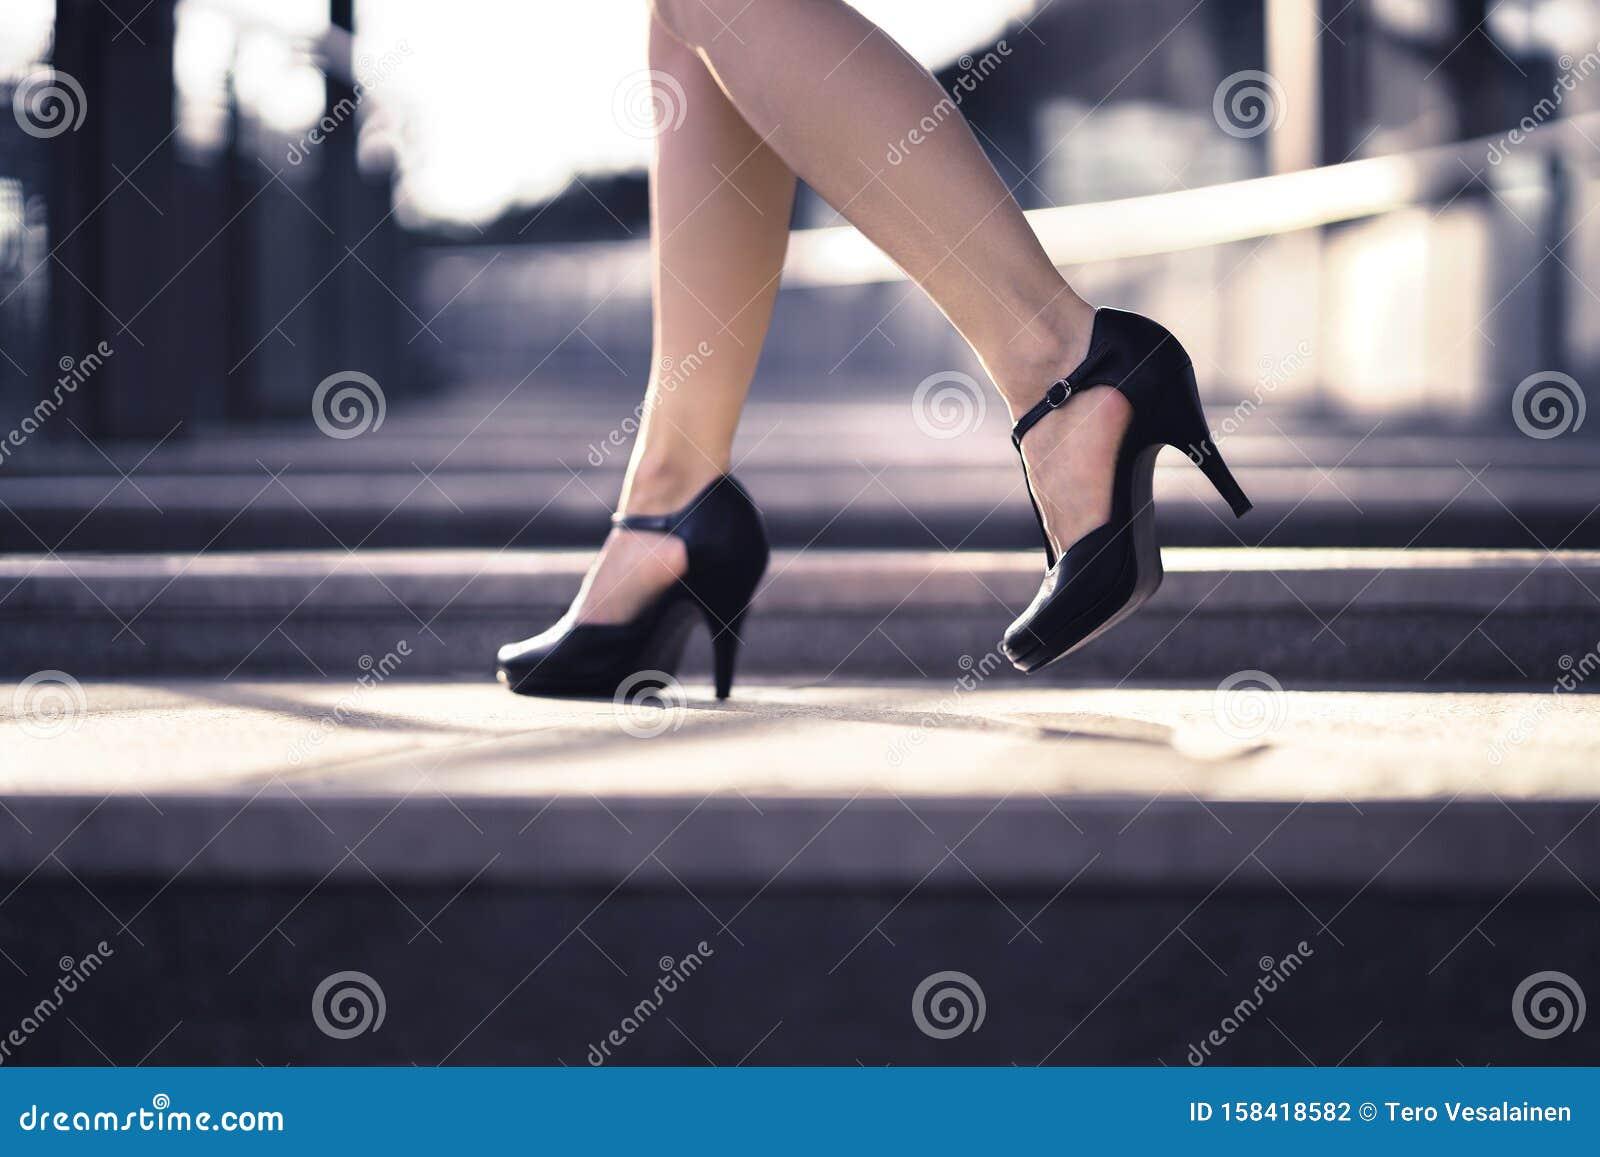 Woman Walking In High Heels In Urban City Street In Summer Chic Stylish Footwear Elegant Fashion Style Stock Photo Image Of Heels High 158418582